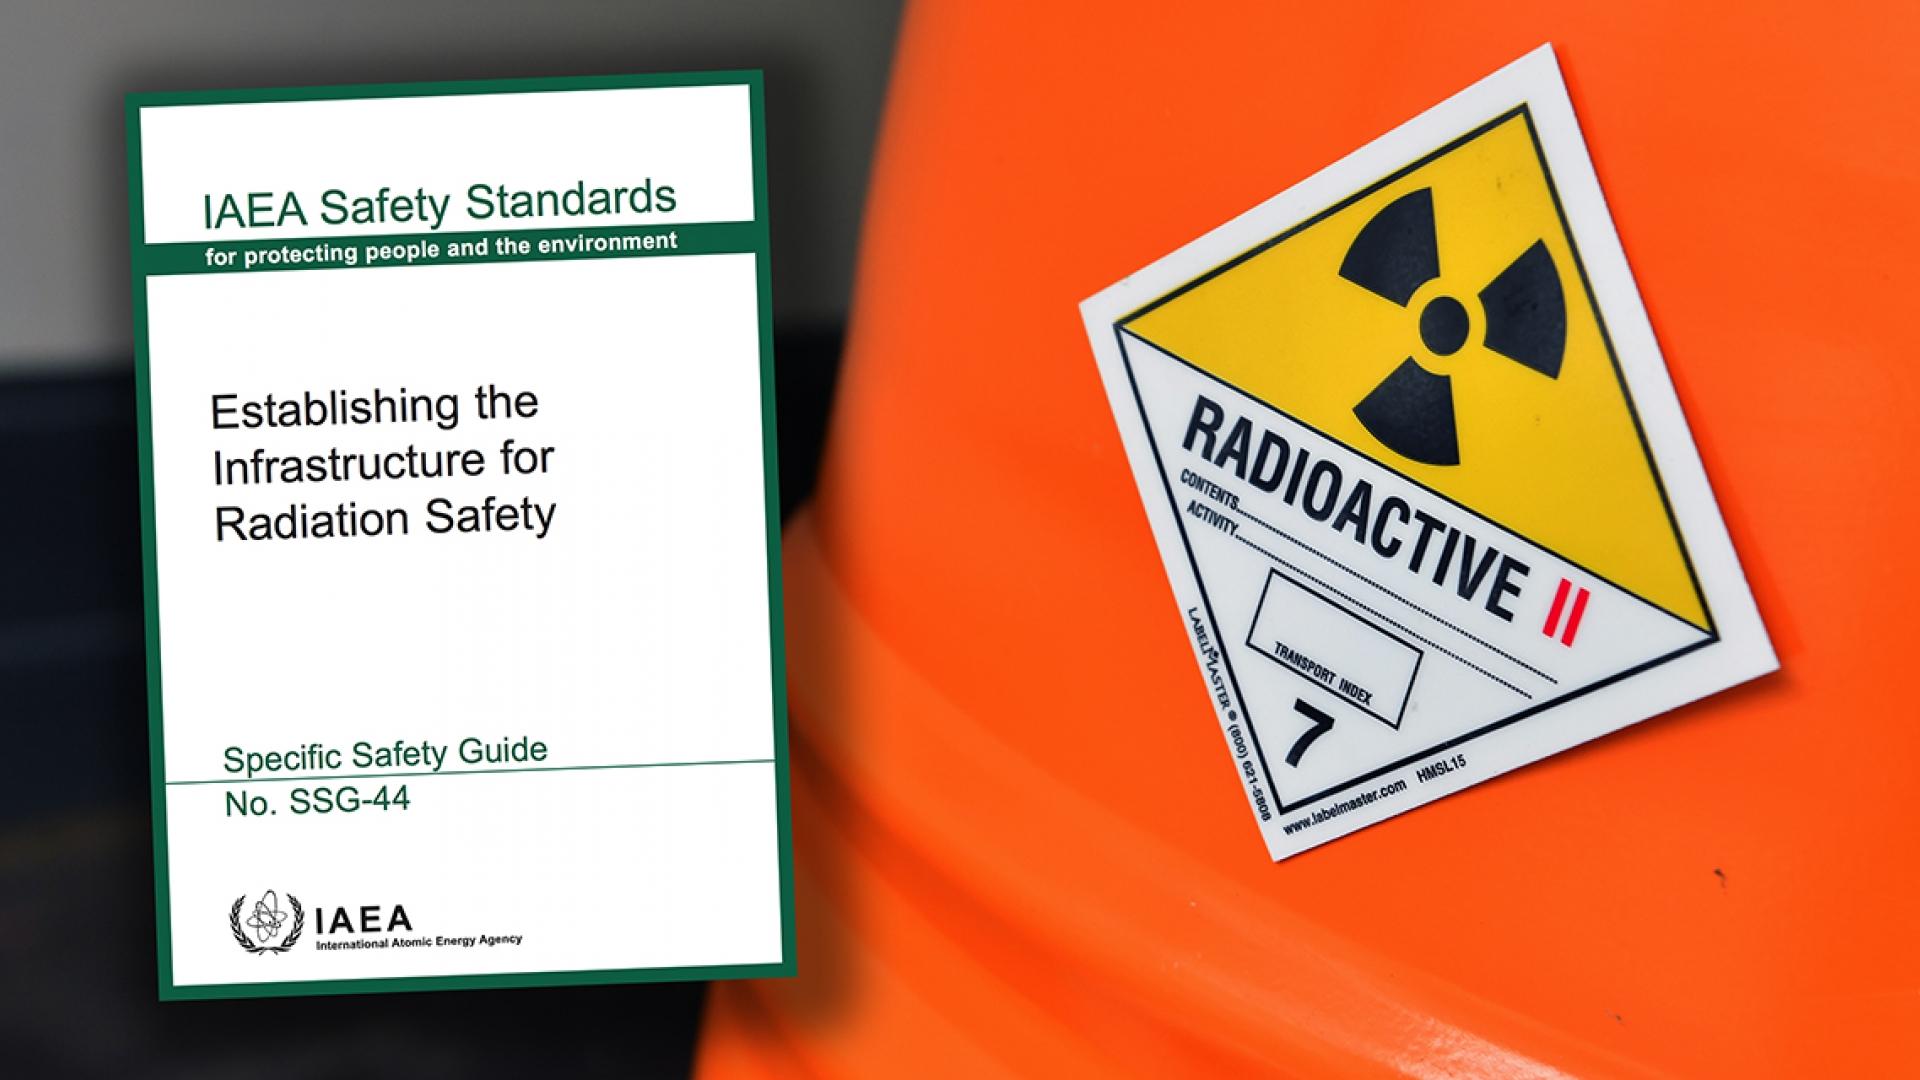 New Iaea Safety Guide Provides Roadmap For Establishing Radiation